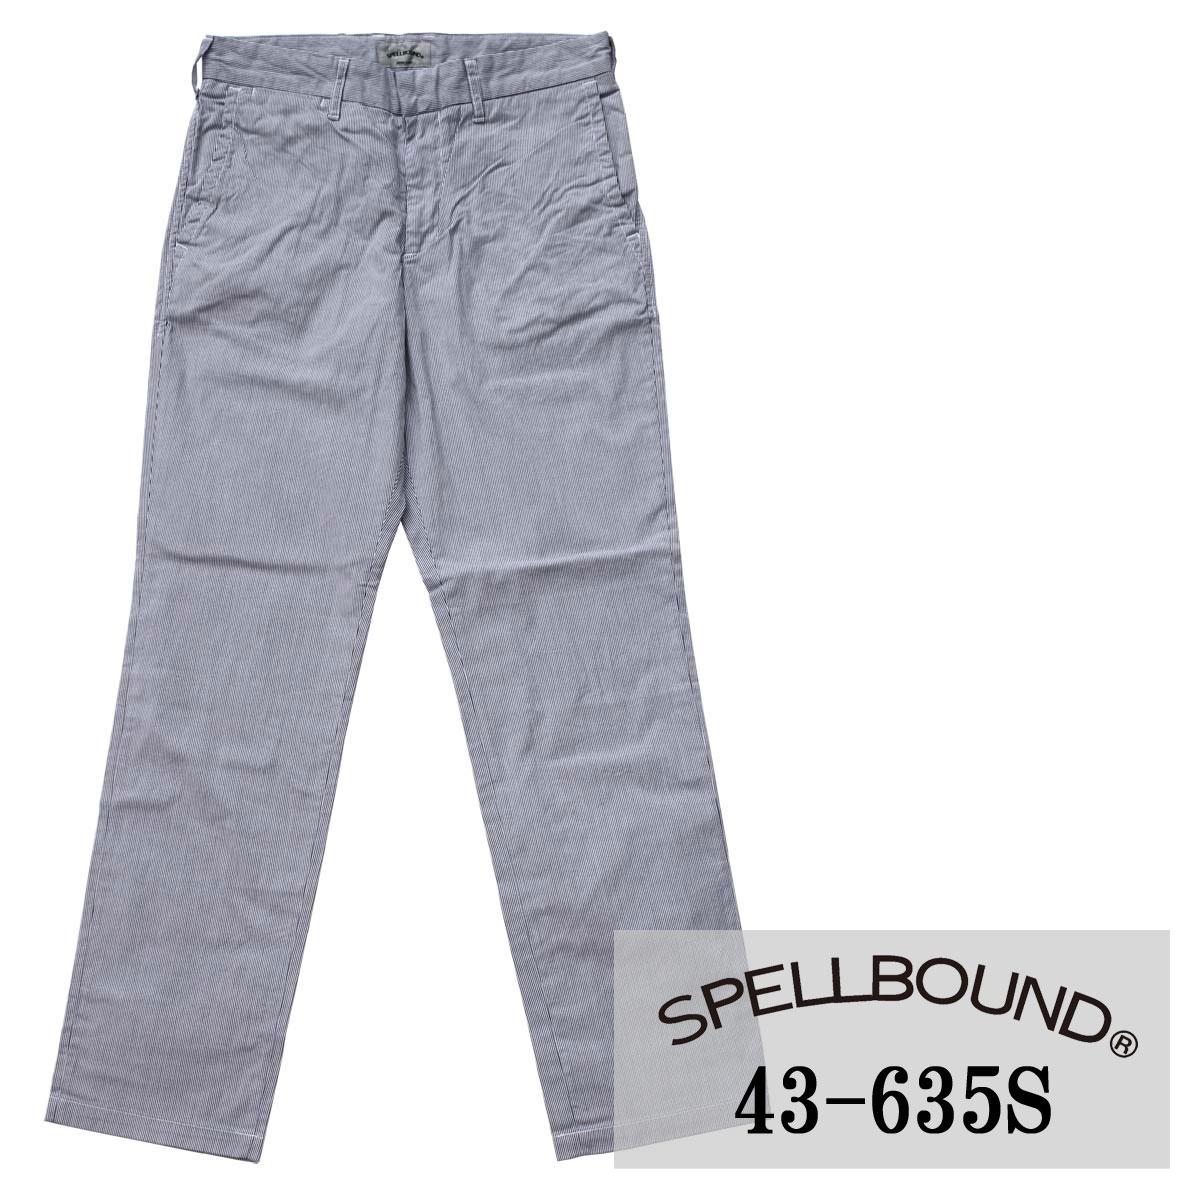 SPELLBOUND:ストレッチ コードレン スタンダードトラウザー(ネイビー):43-635S スペルバウンド メンズ 裾上げ 夏用 夏服